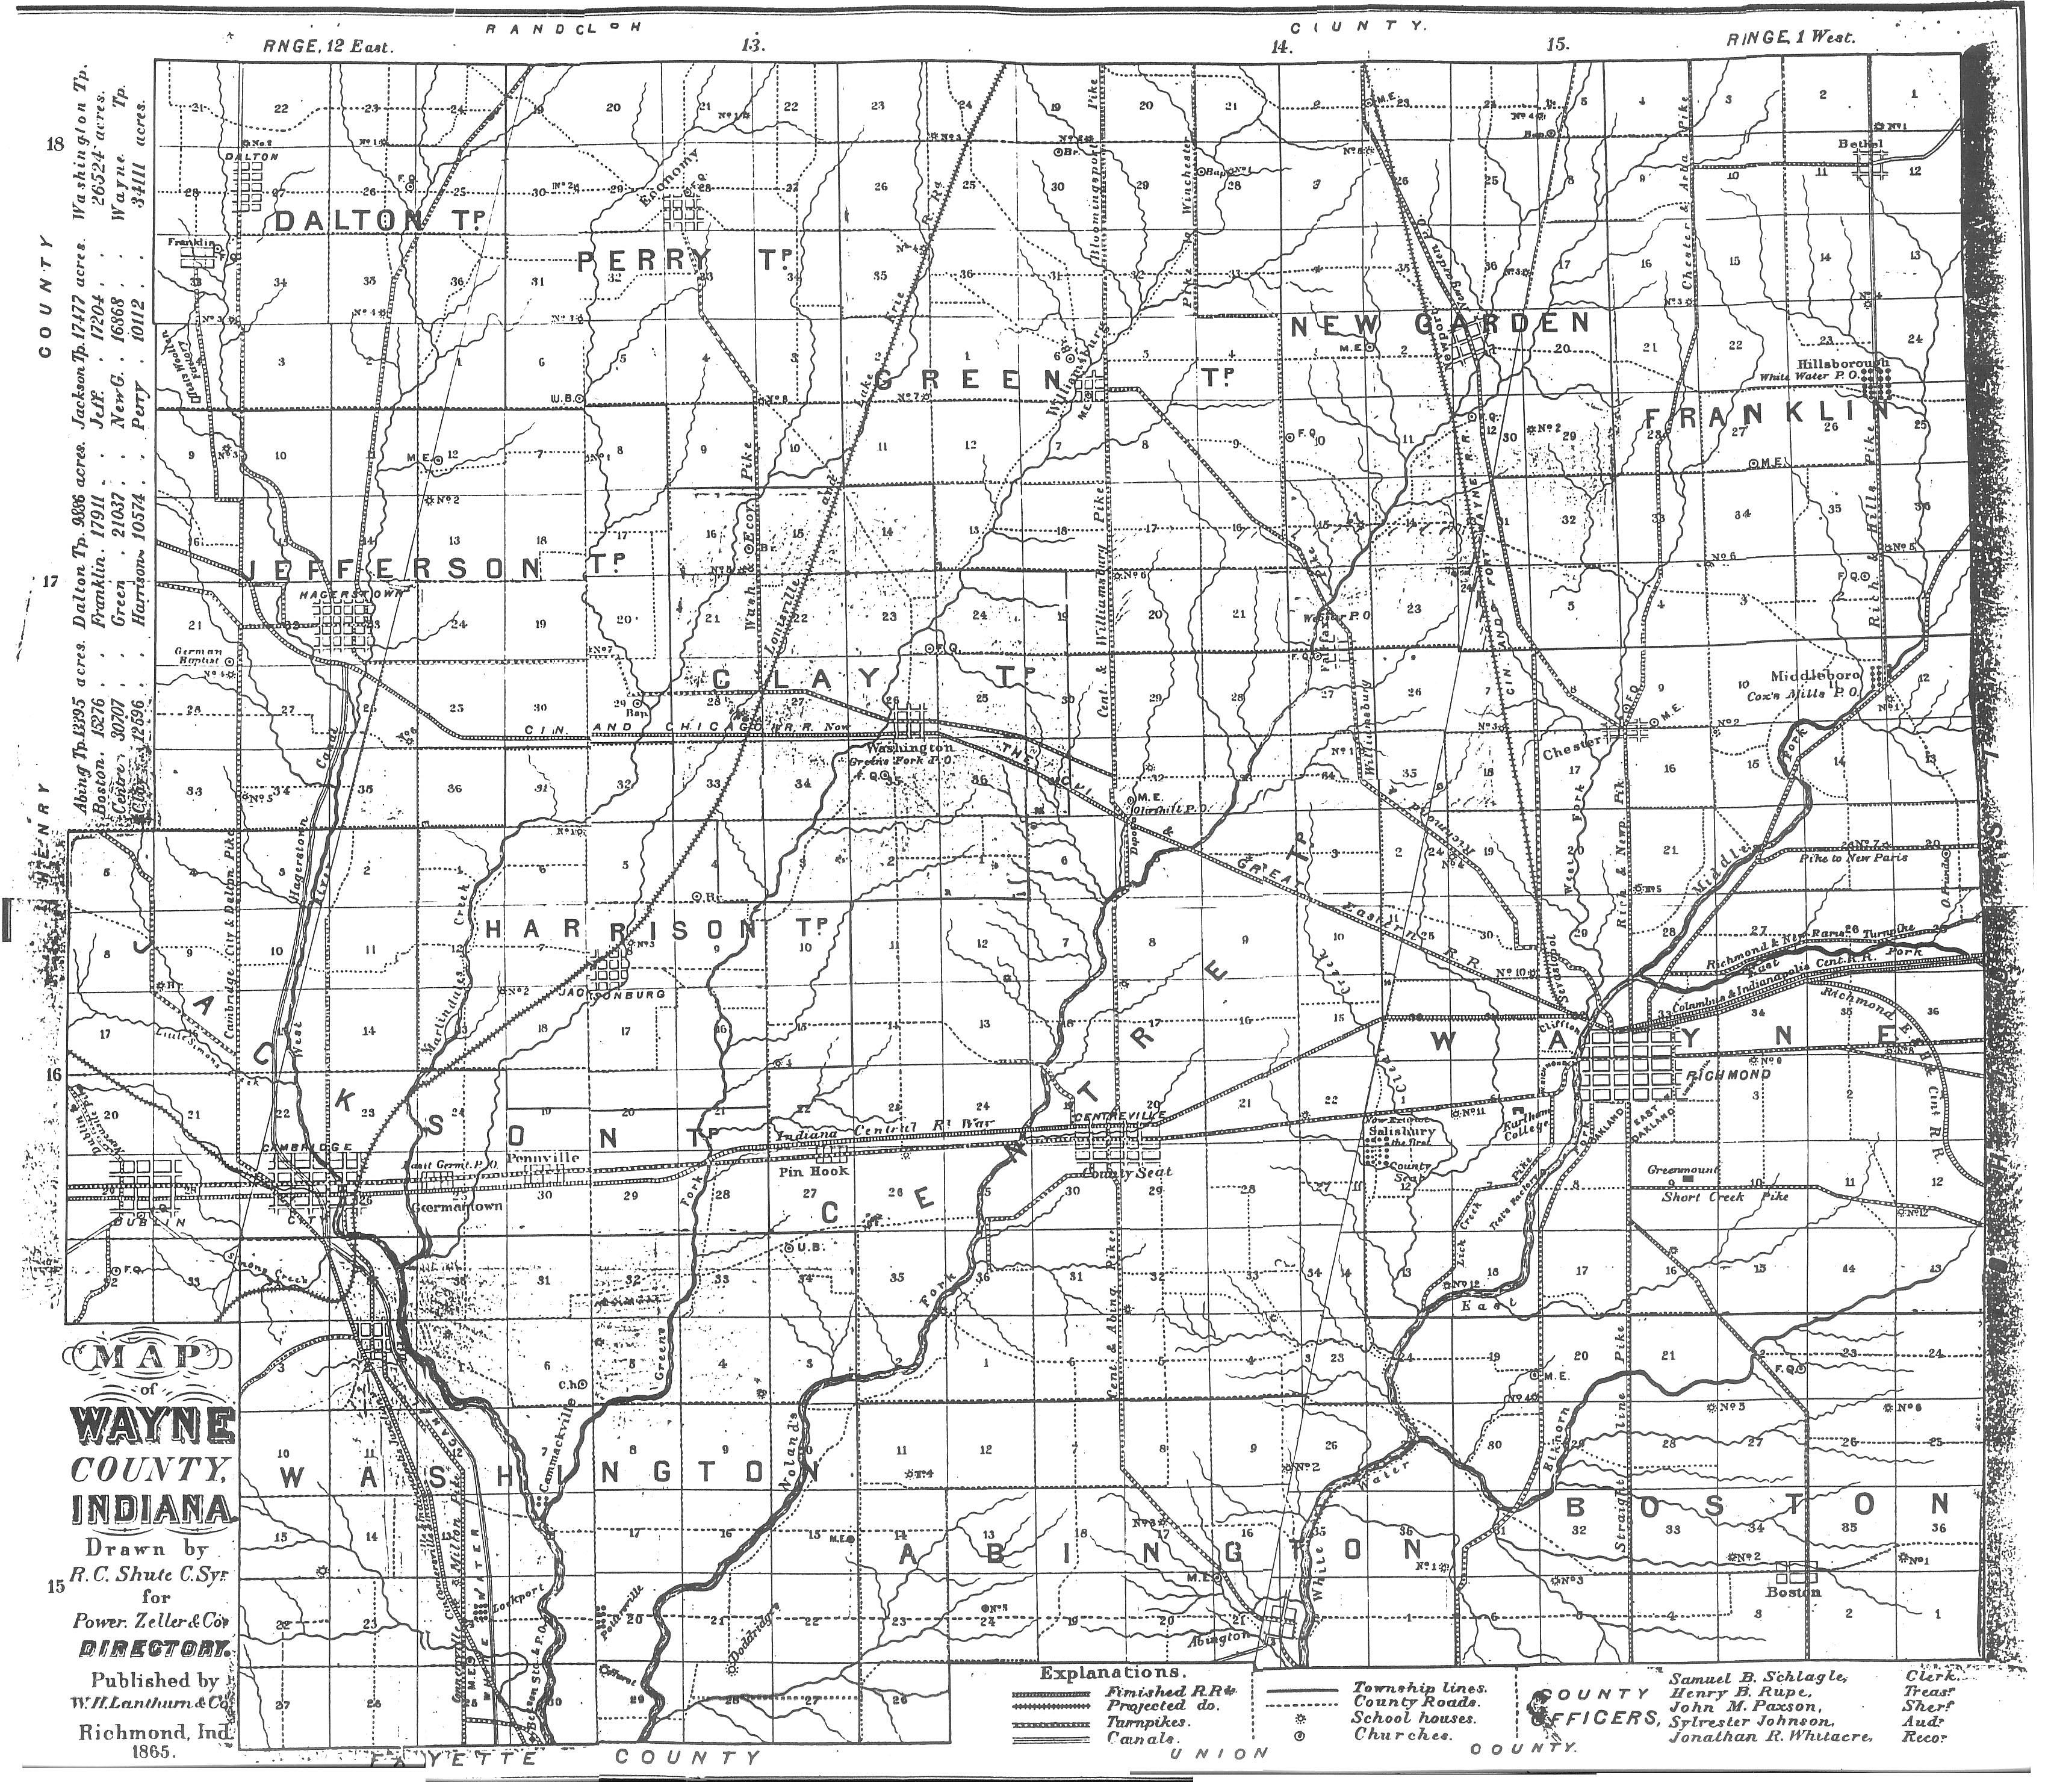 Maps for Richmond and Wayne County, Indiana Map Of Wayne County Ohio on